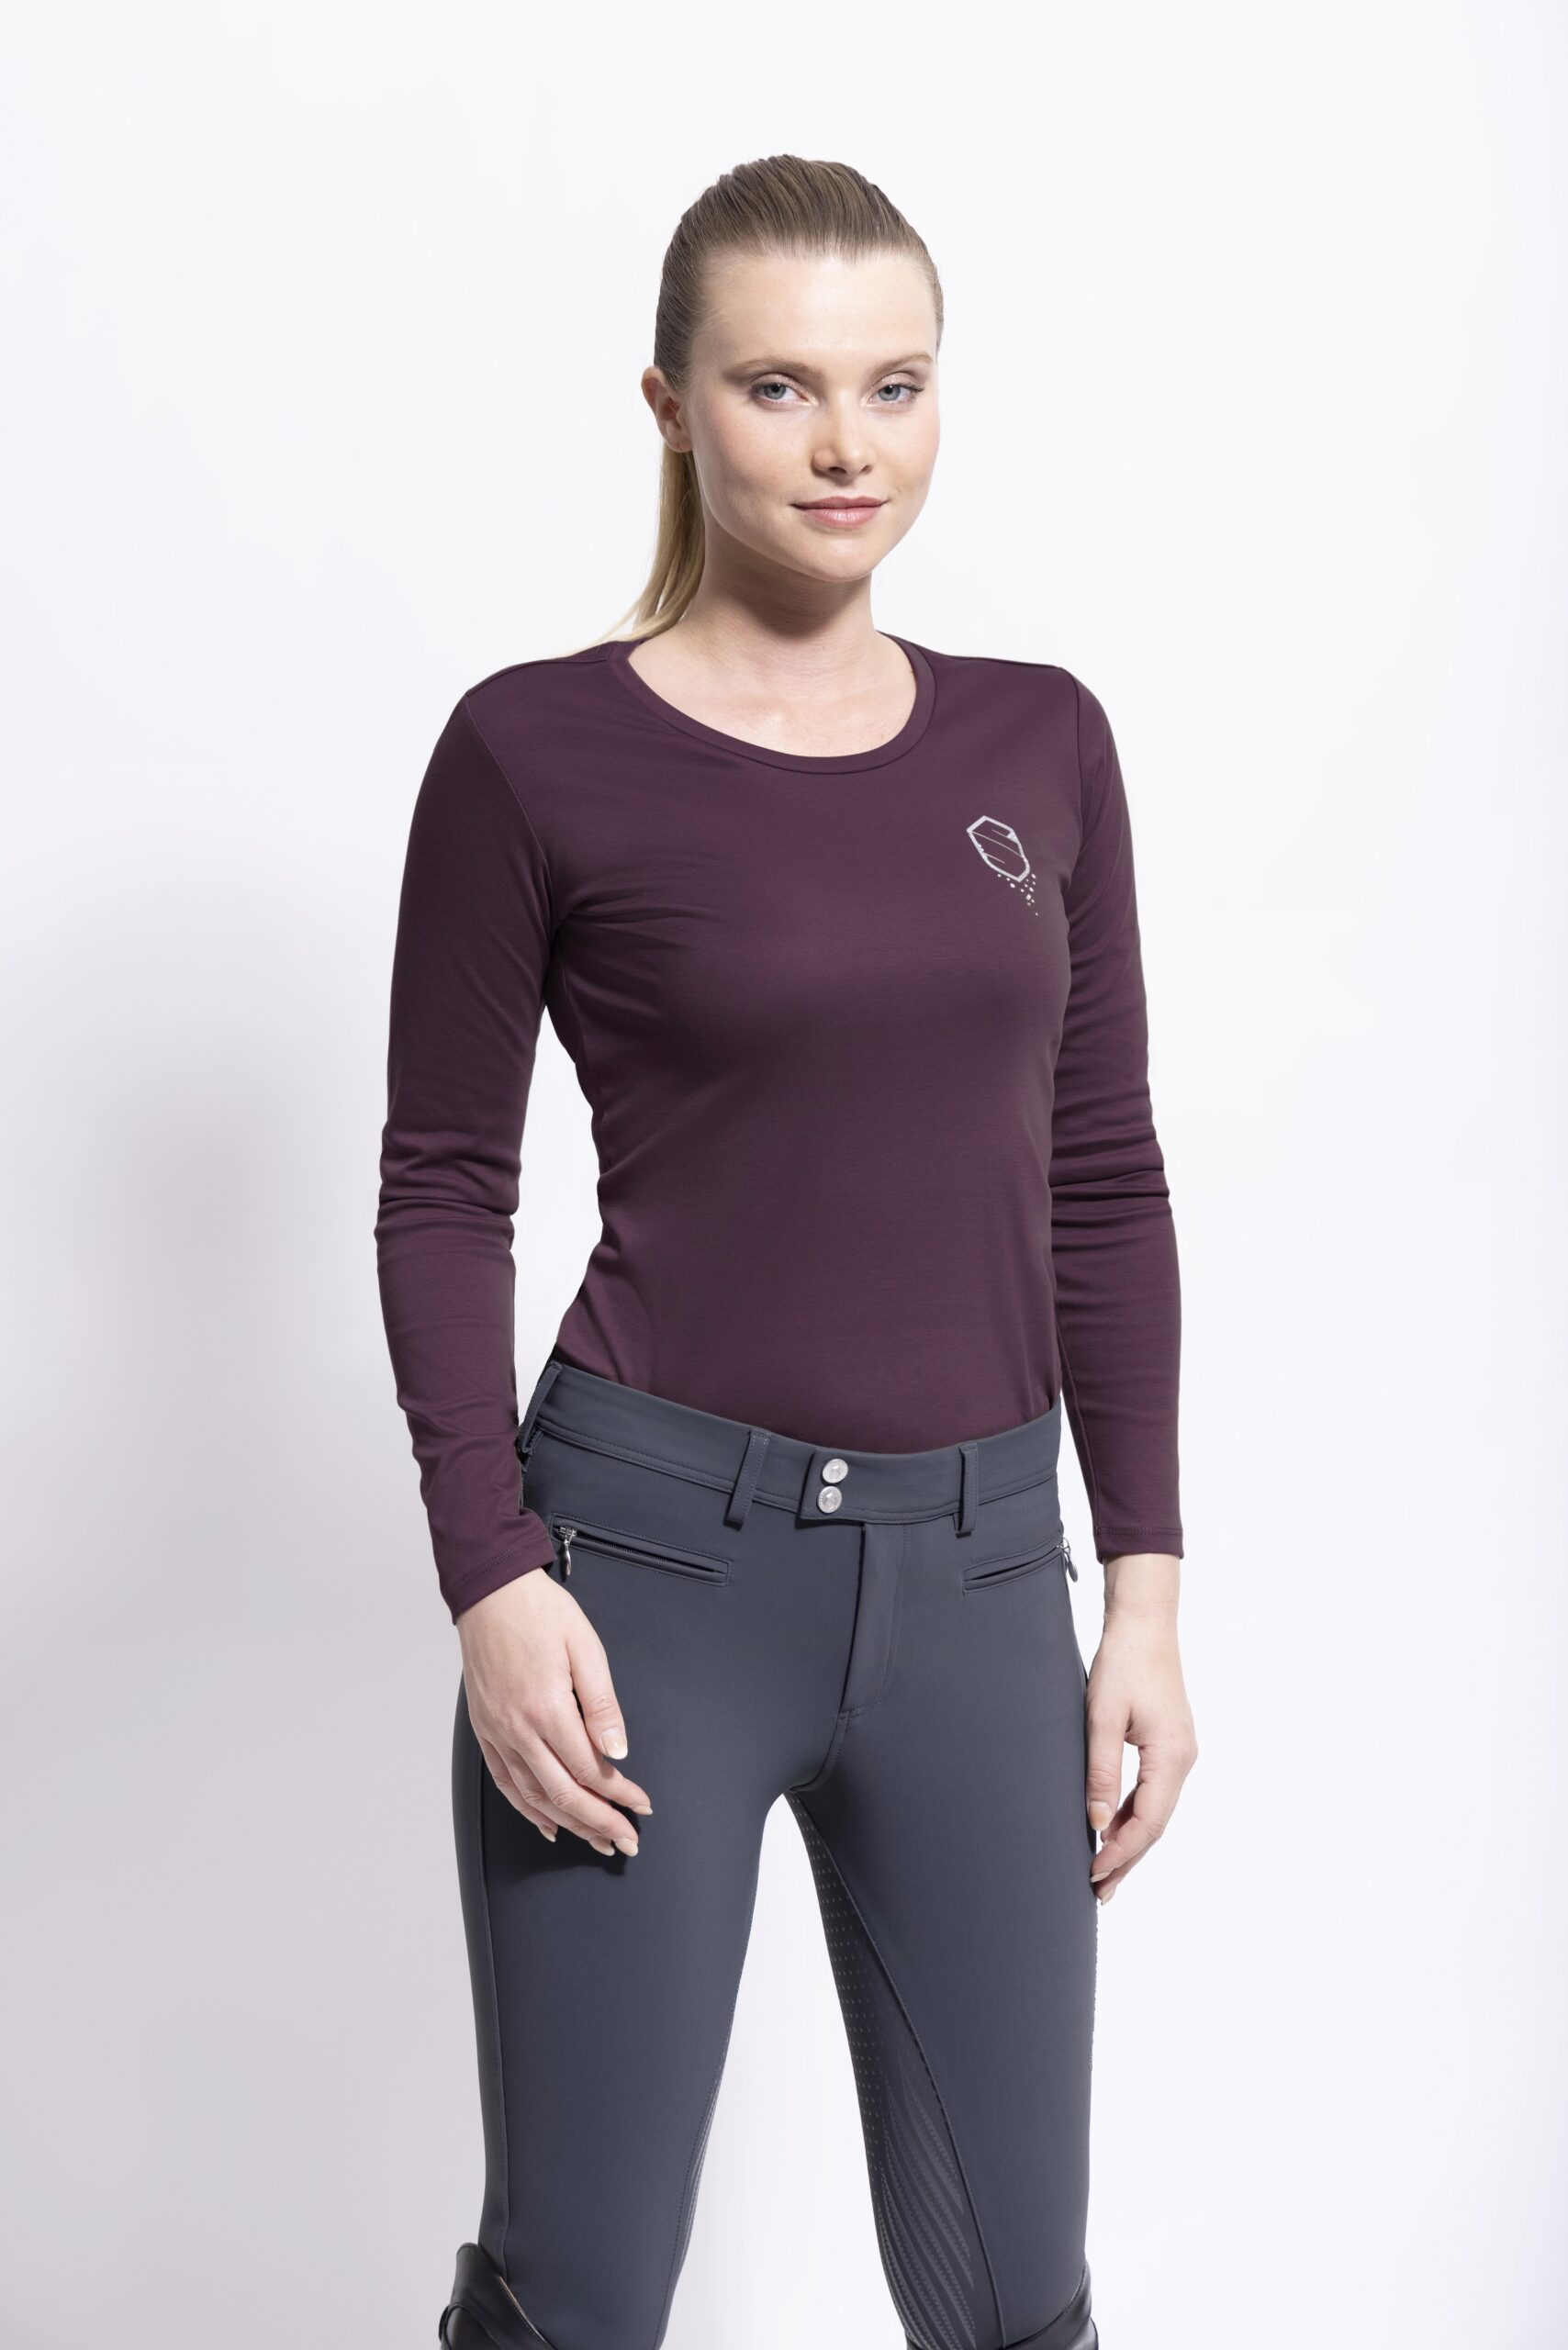 Samshield-T-shirt-FW21-Axelle-Aubergine-